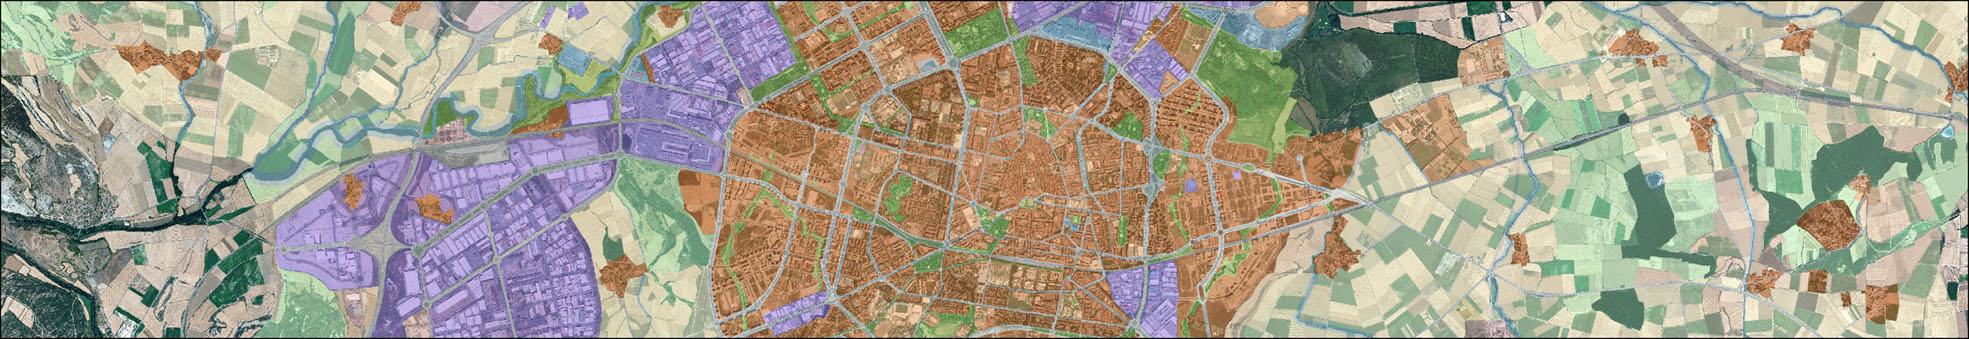 Mapa del PGOU